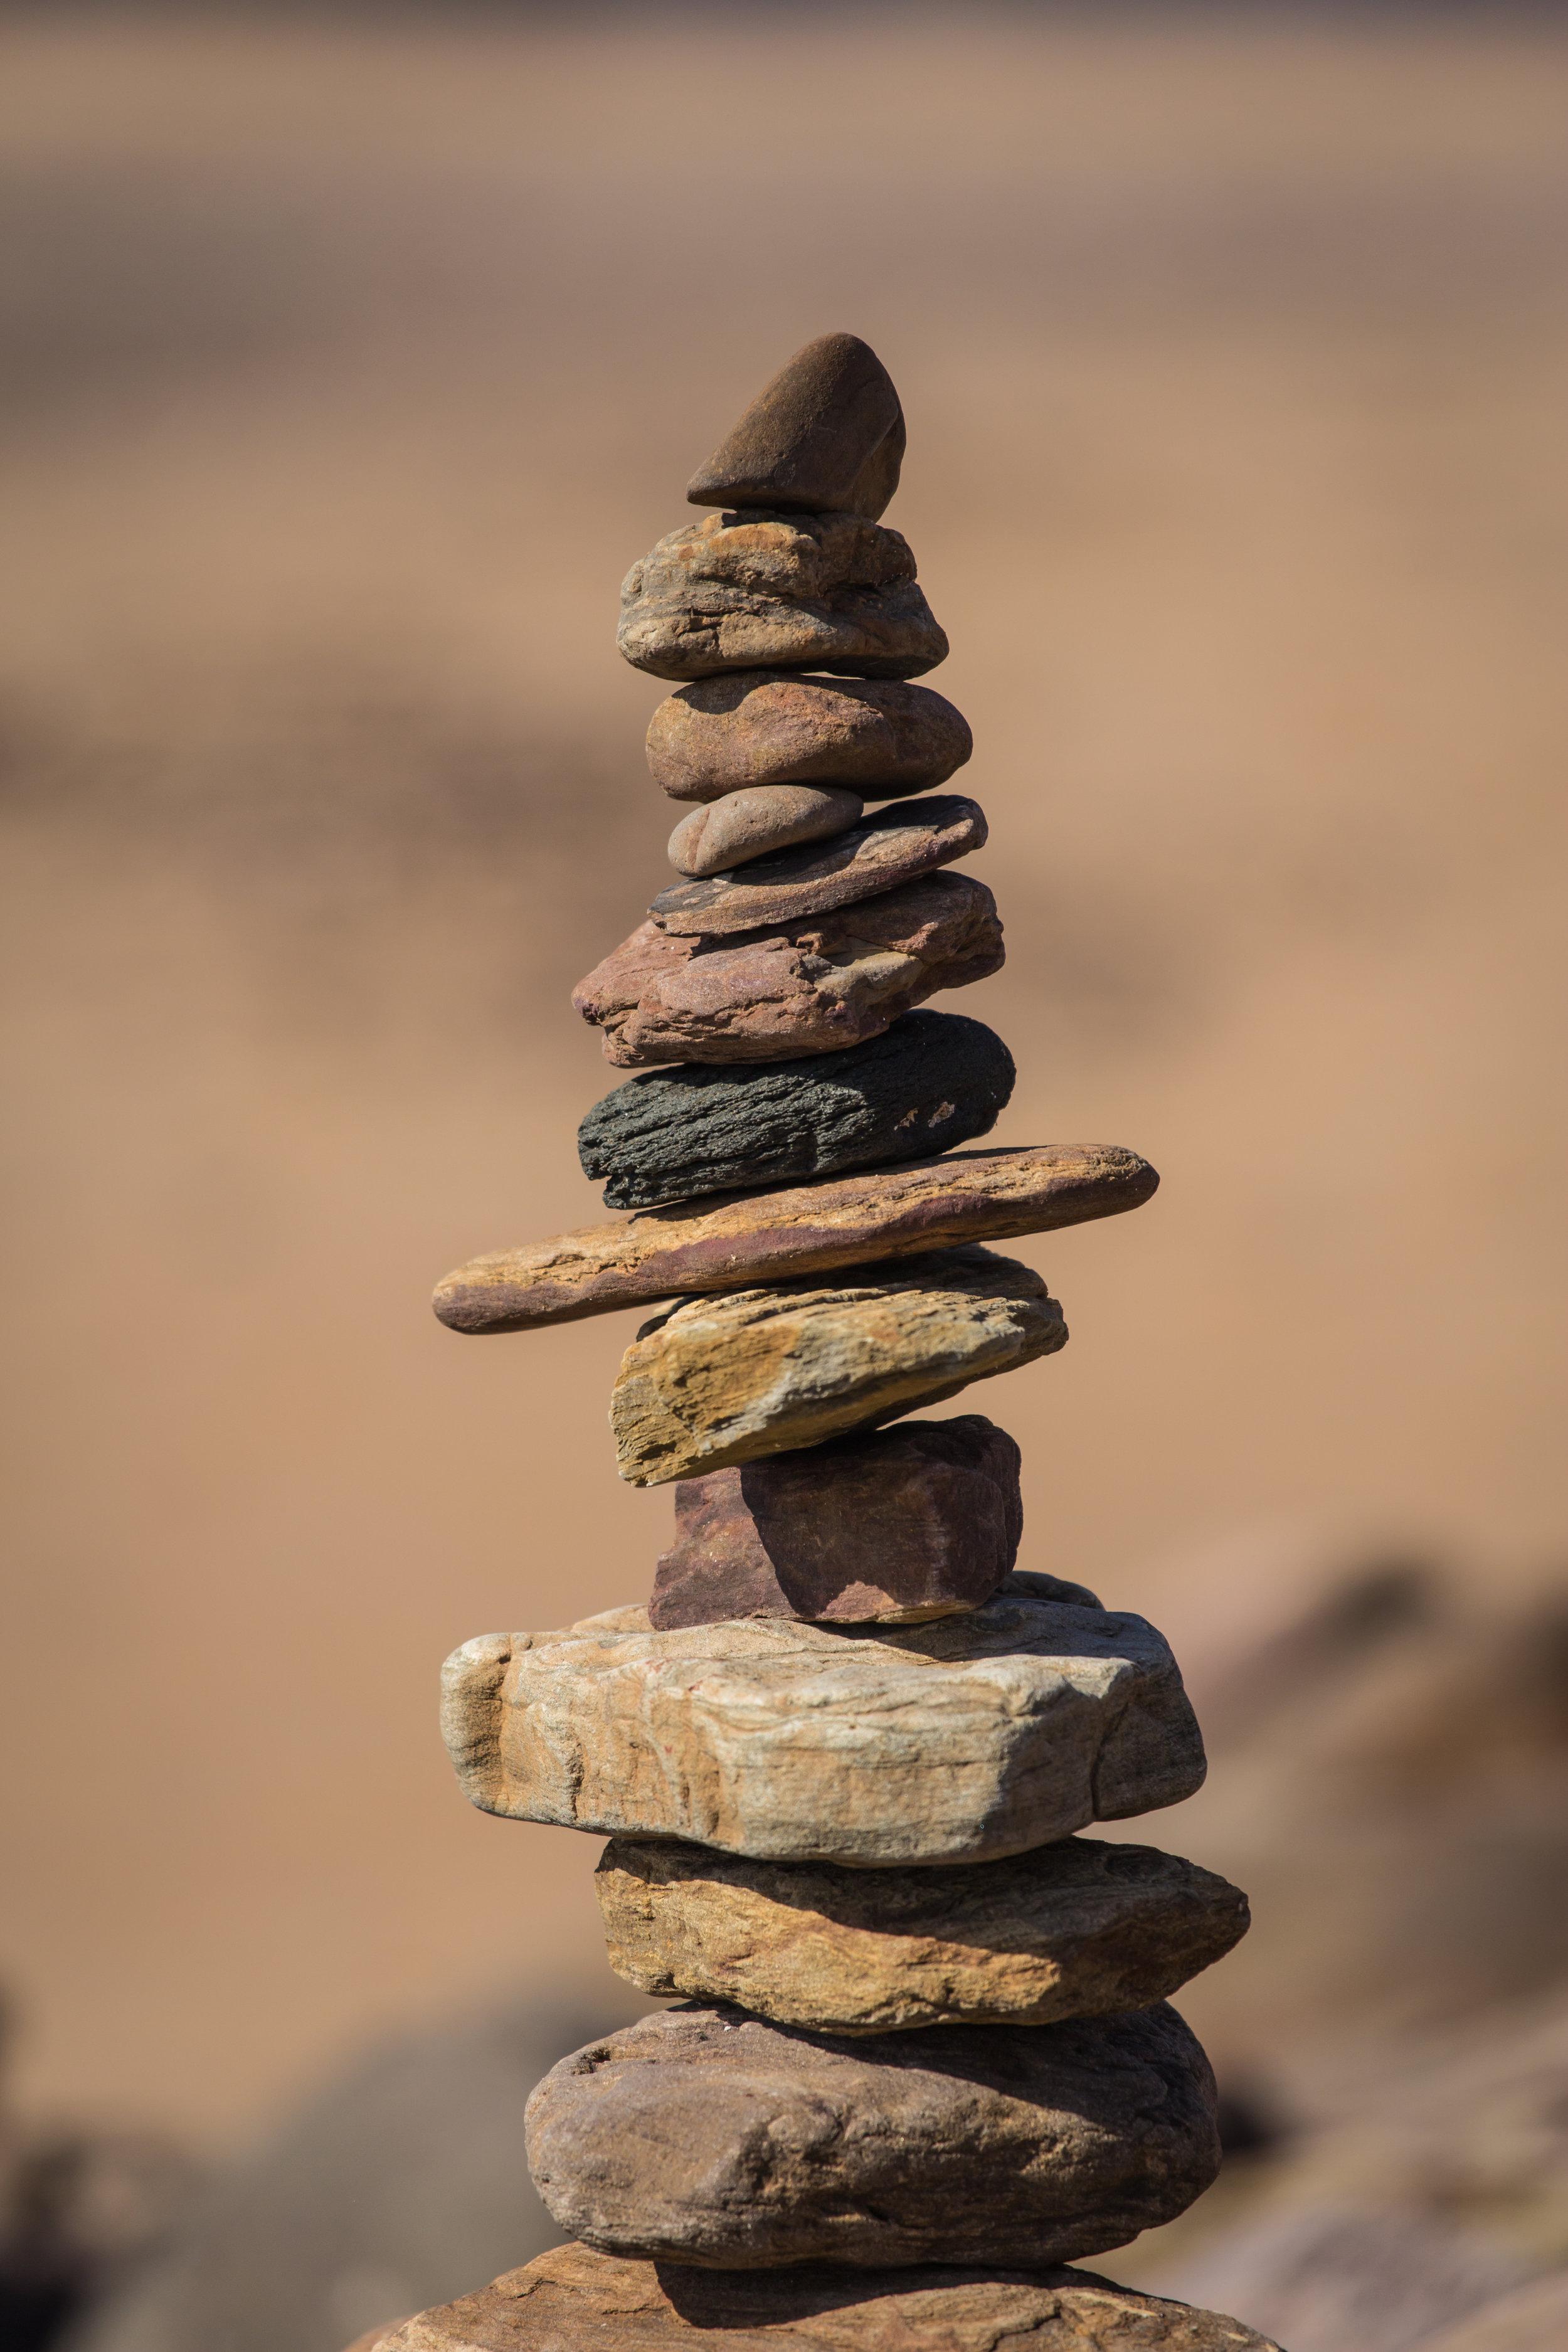 Tower of rocks on beach